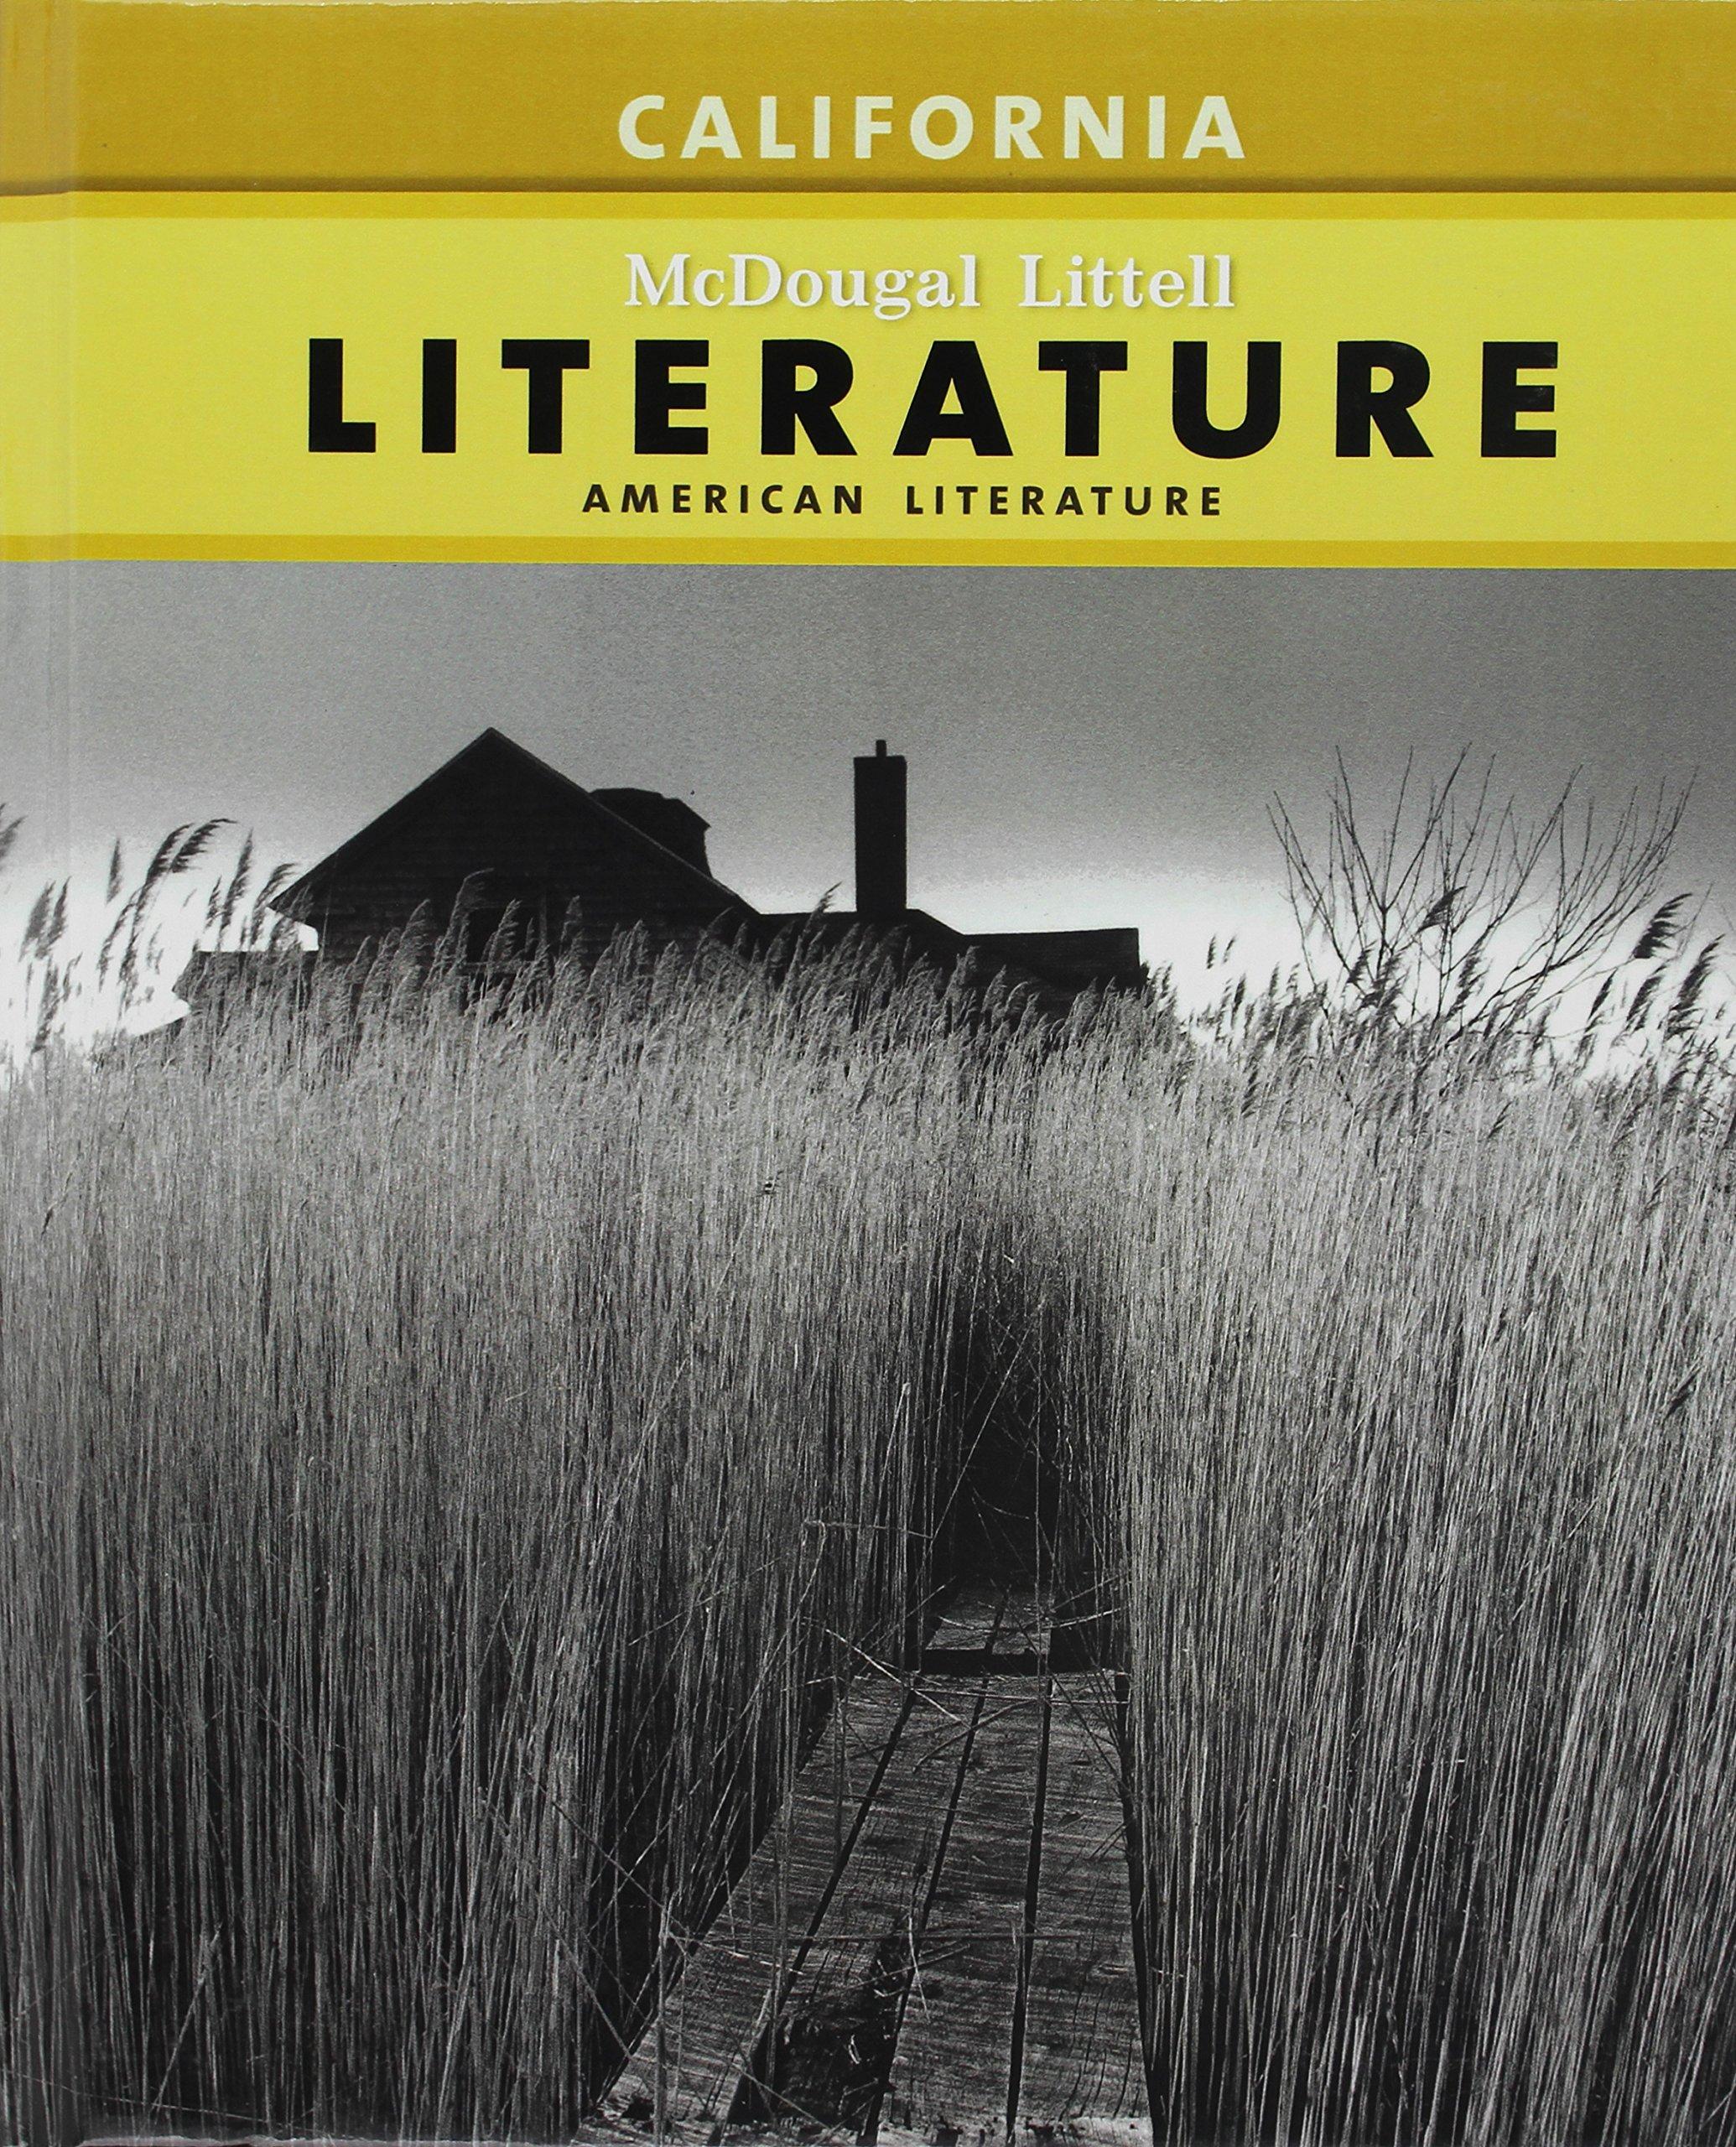 Download McDougal Littell Literature: Pupil's Edition American Literature CA 2009 ebook